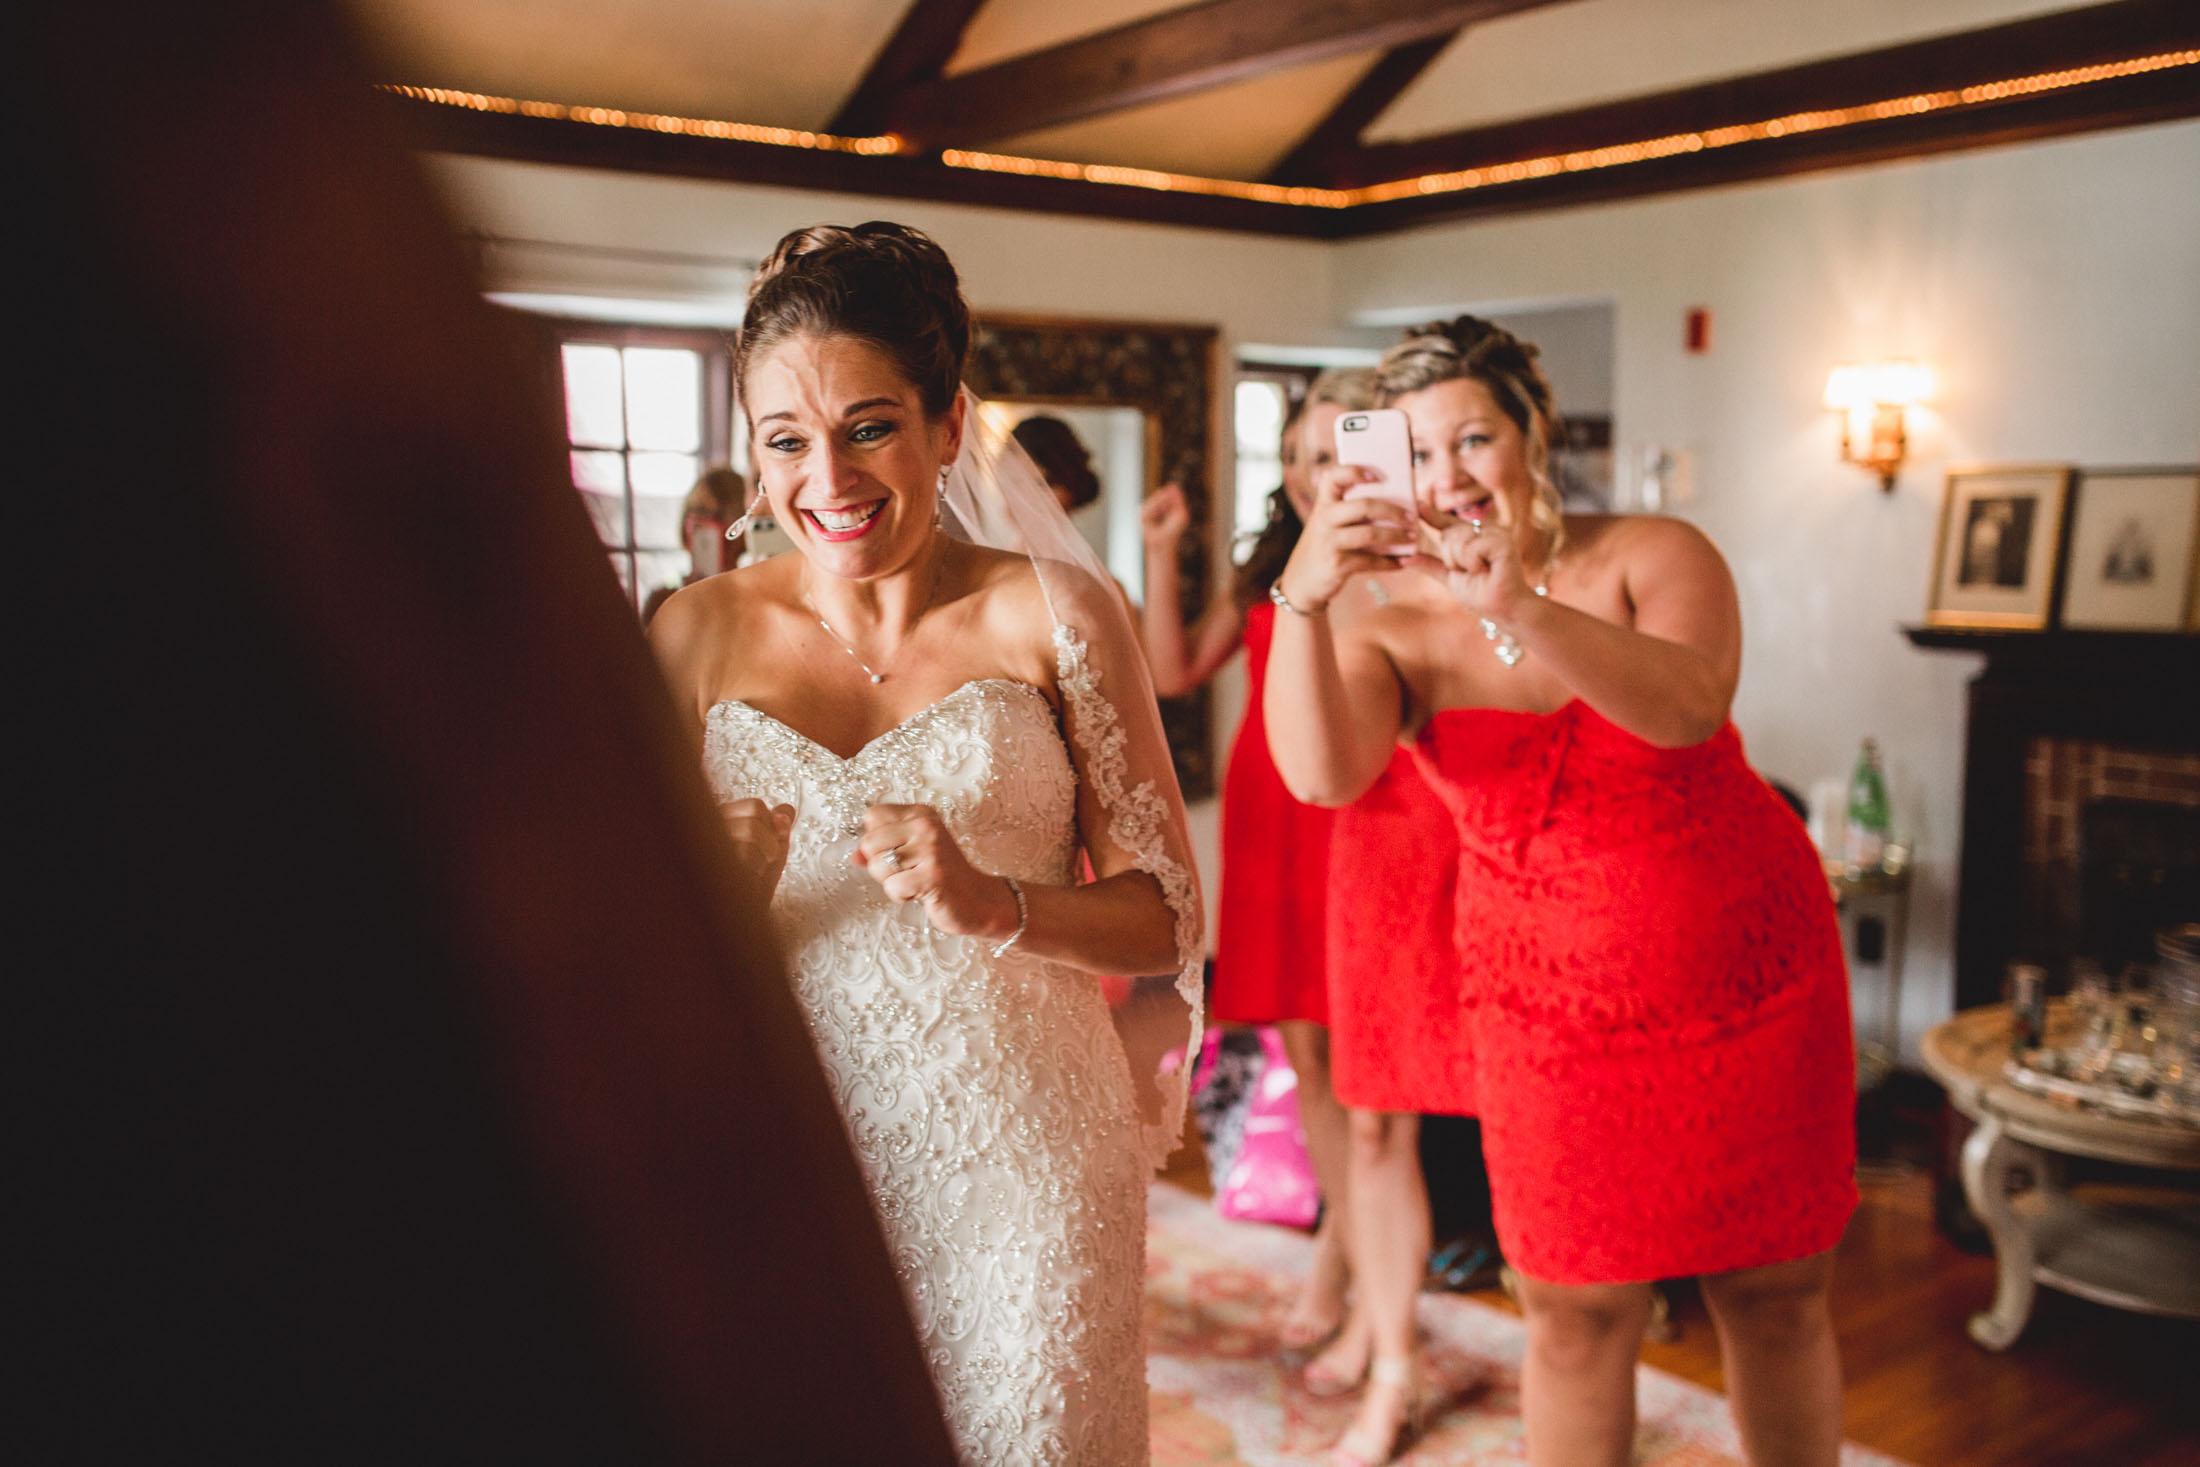 Willowdale-wedding-photography-5.jpg